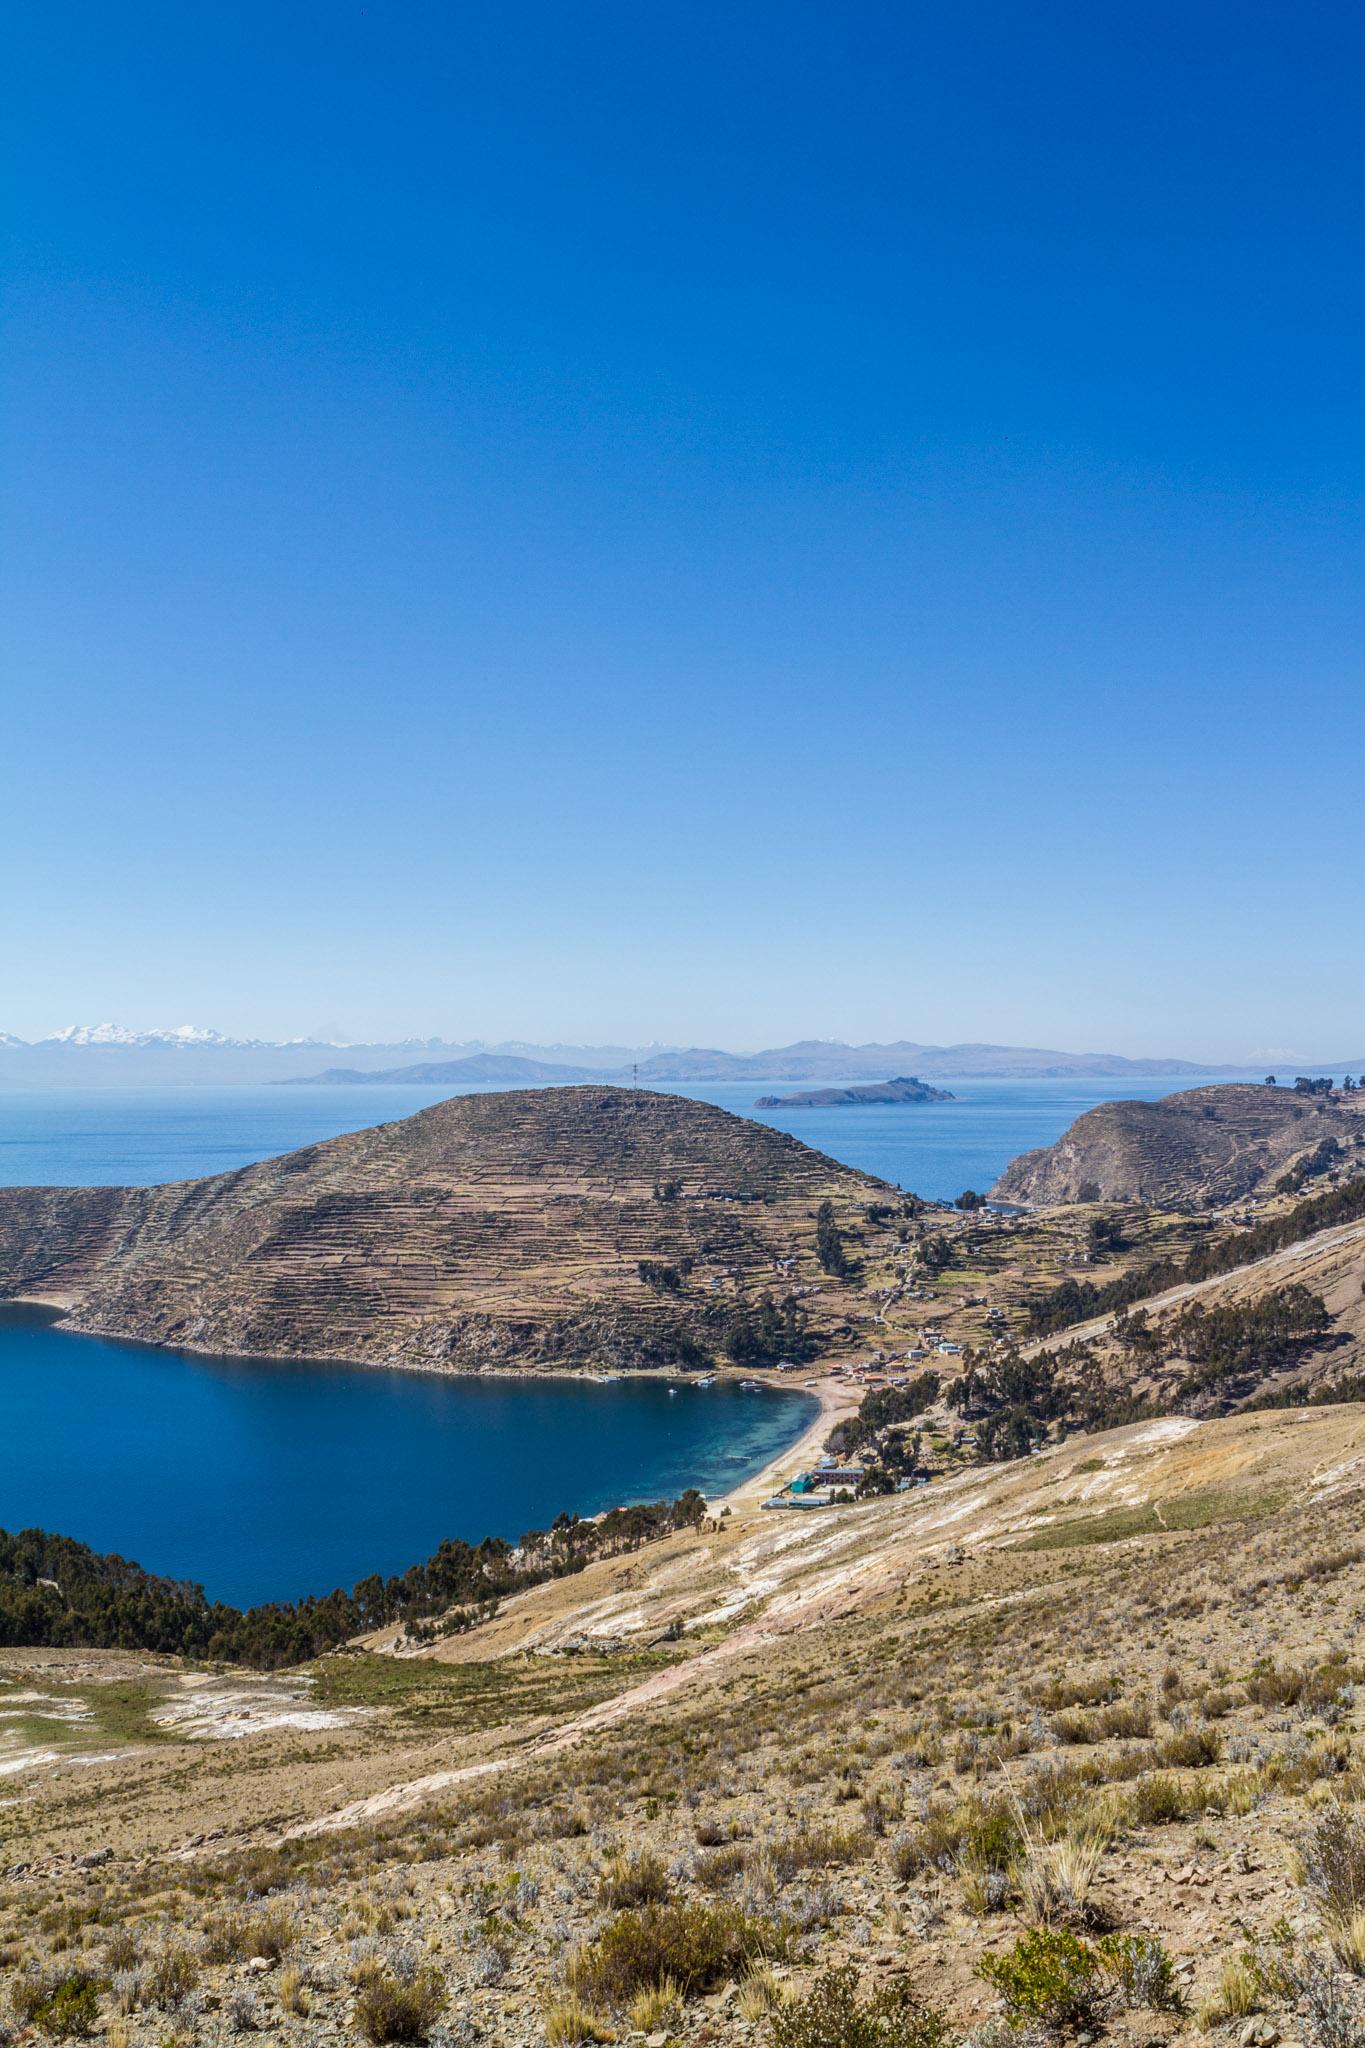 Ali-Barqawi-Studios-Explore-Series-Travel-Adventure-Documentary-C4CGAZA-Bolivia-Lake-Titicaca-2015-064.jpg